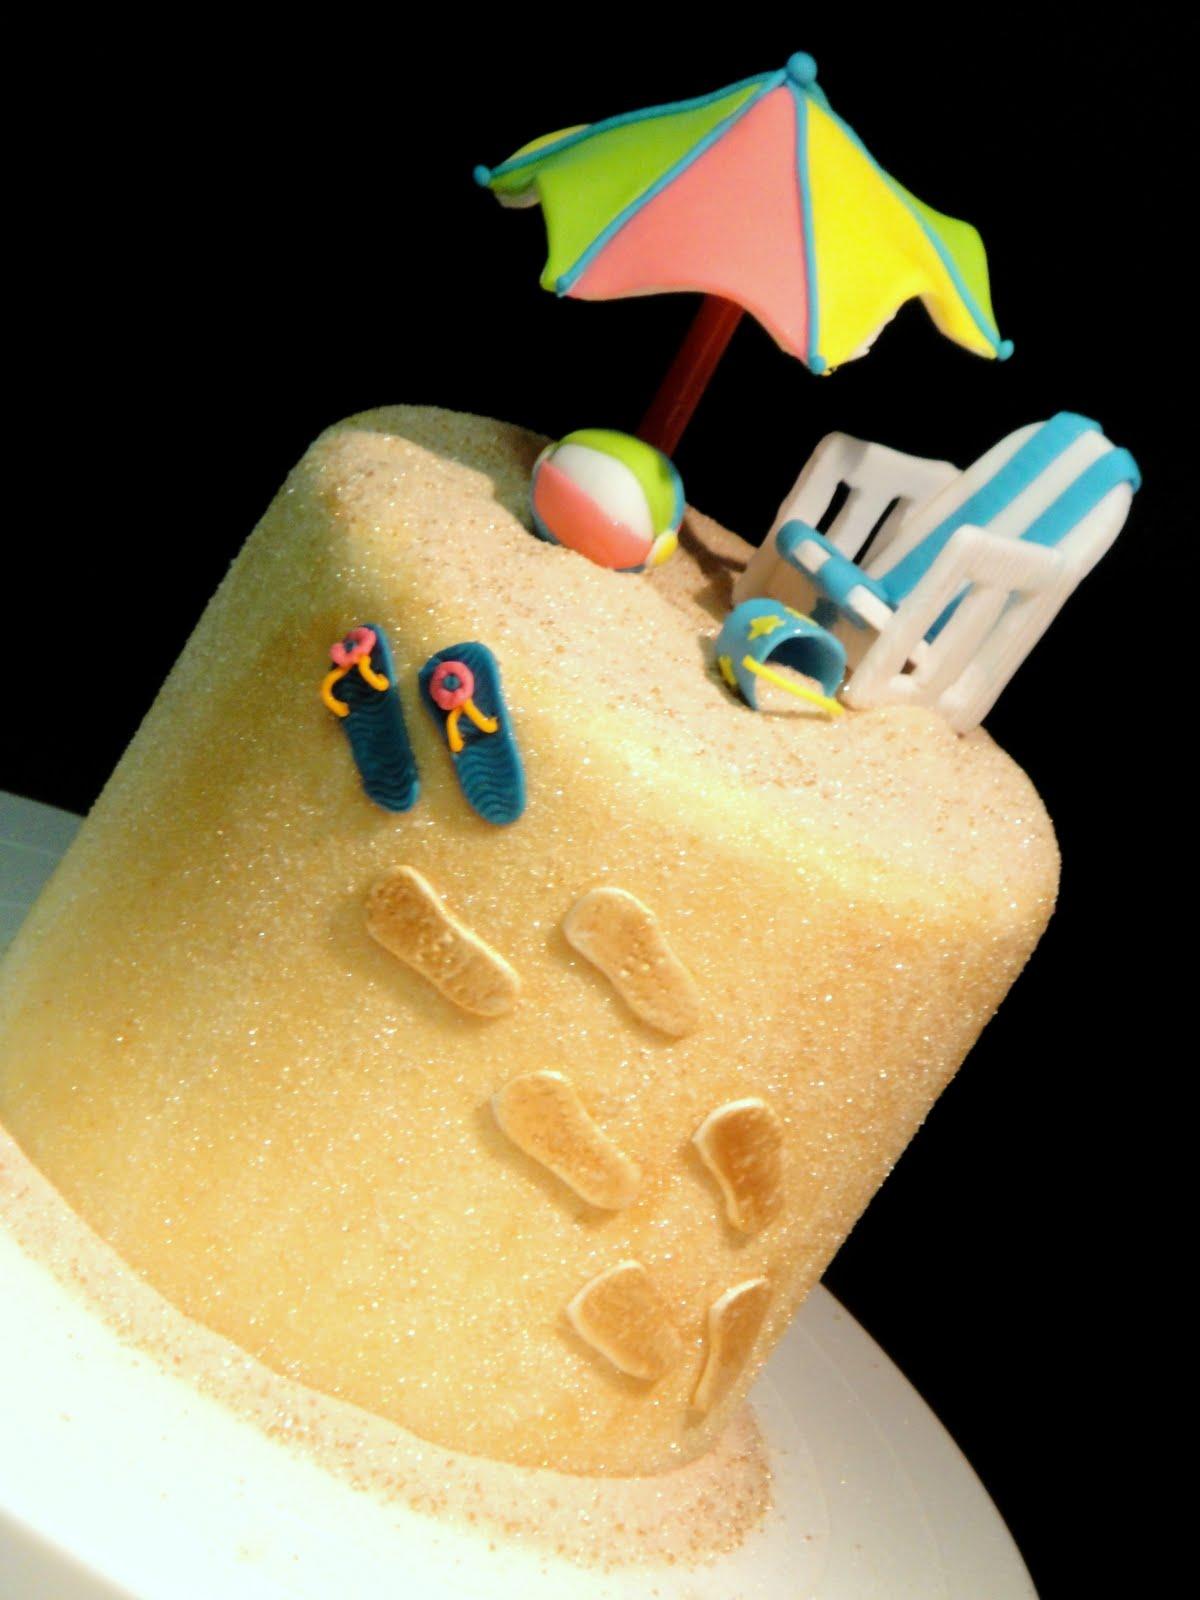 Sand Sugar for Cake Decorating